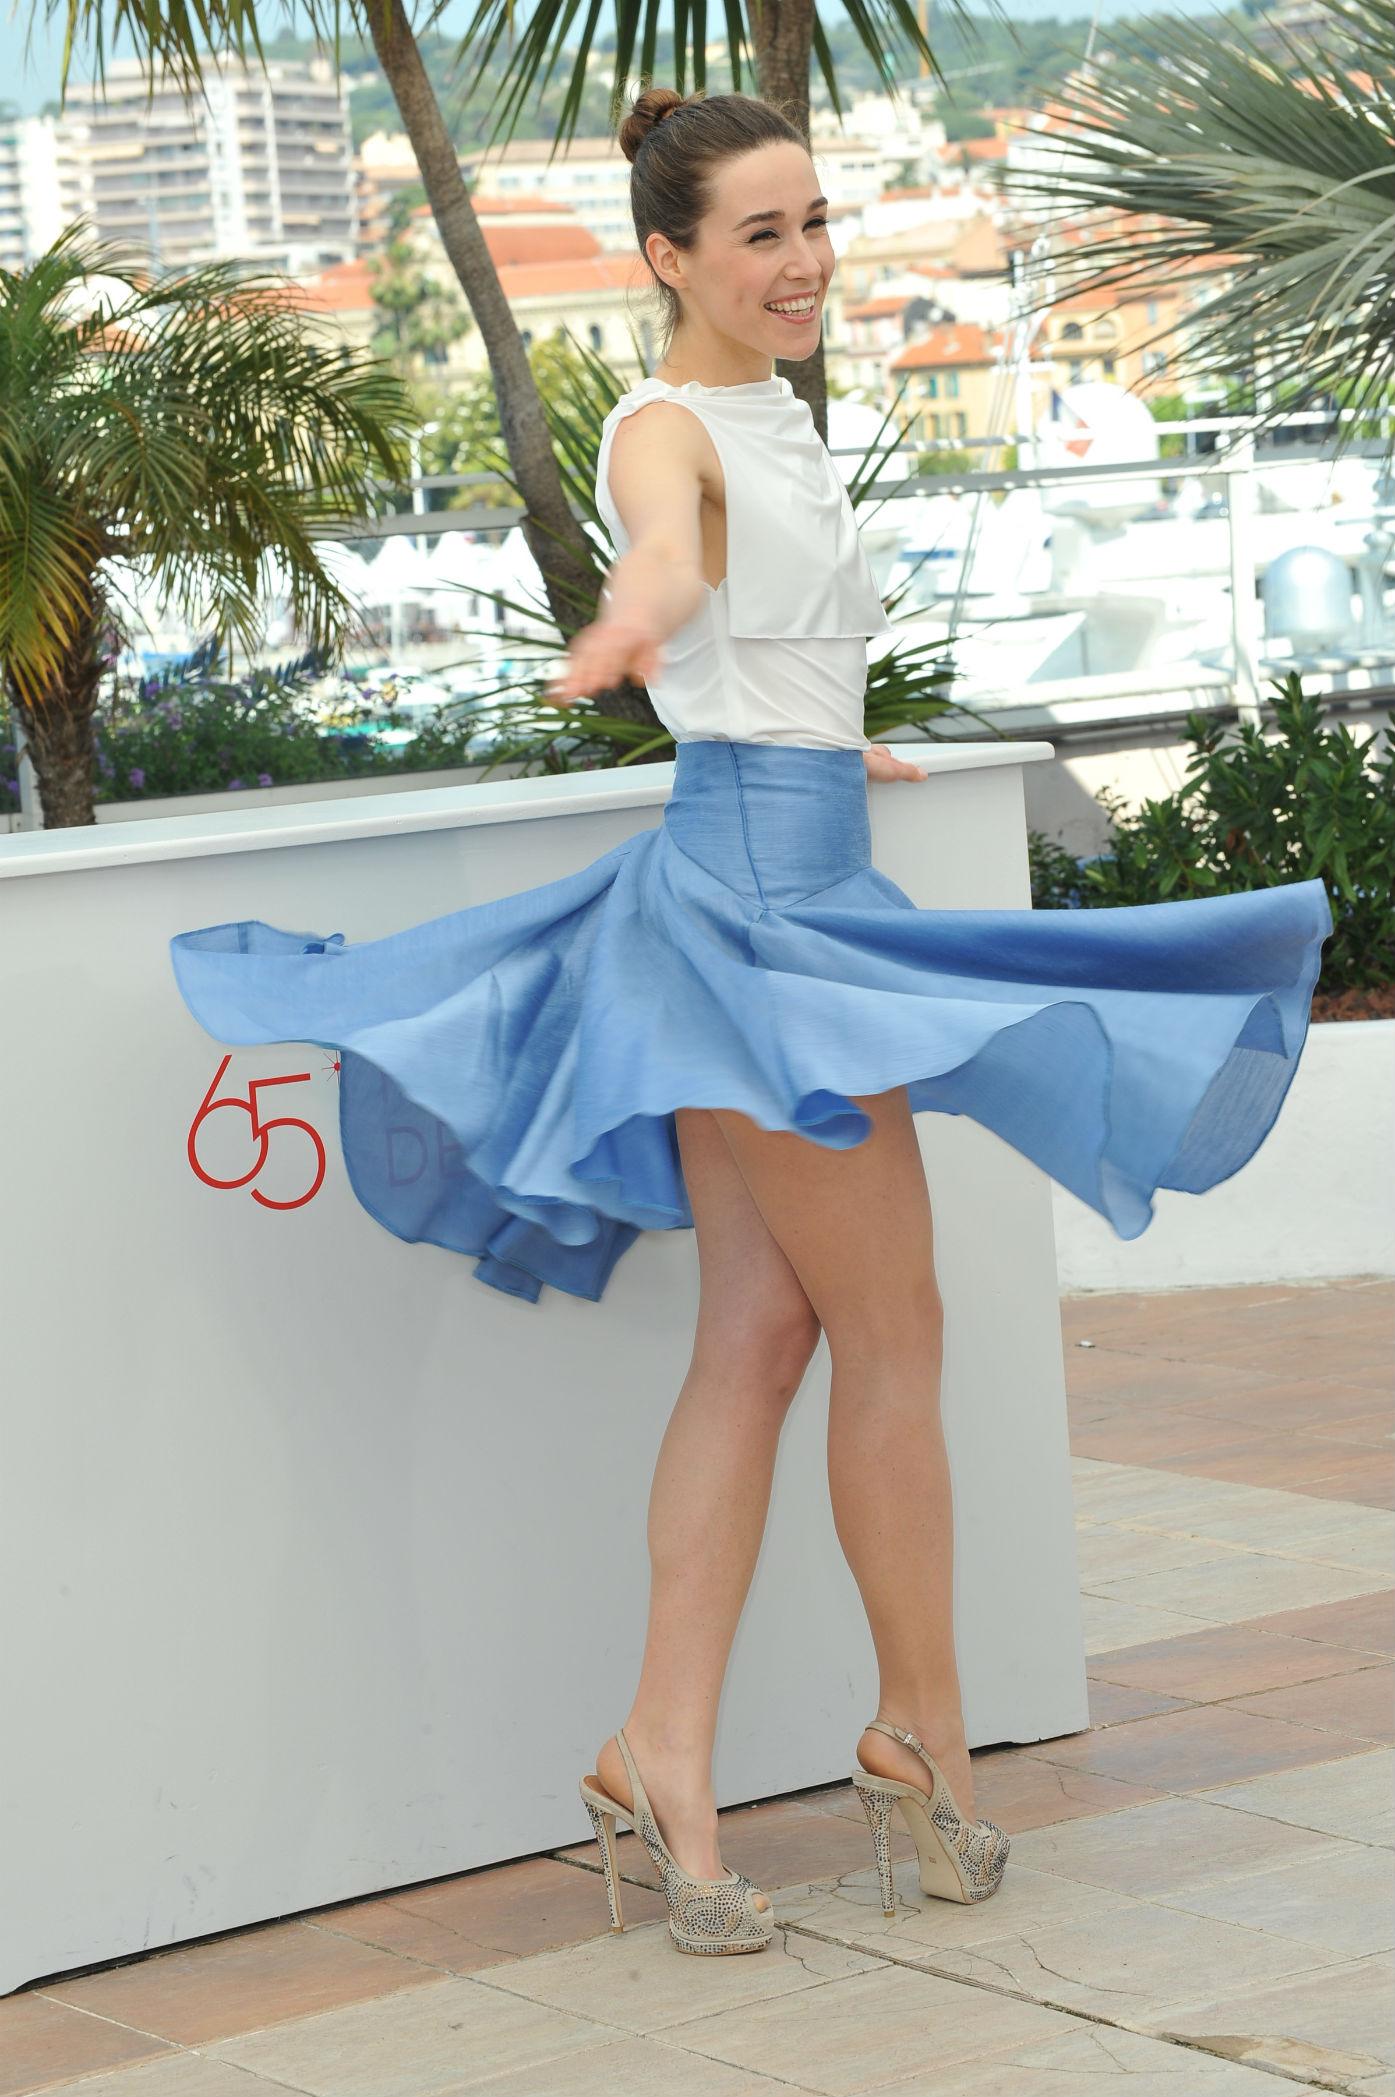 20 Female Celebs You Forgot Had Upskirt Photos Taken Of Them